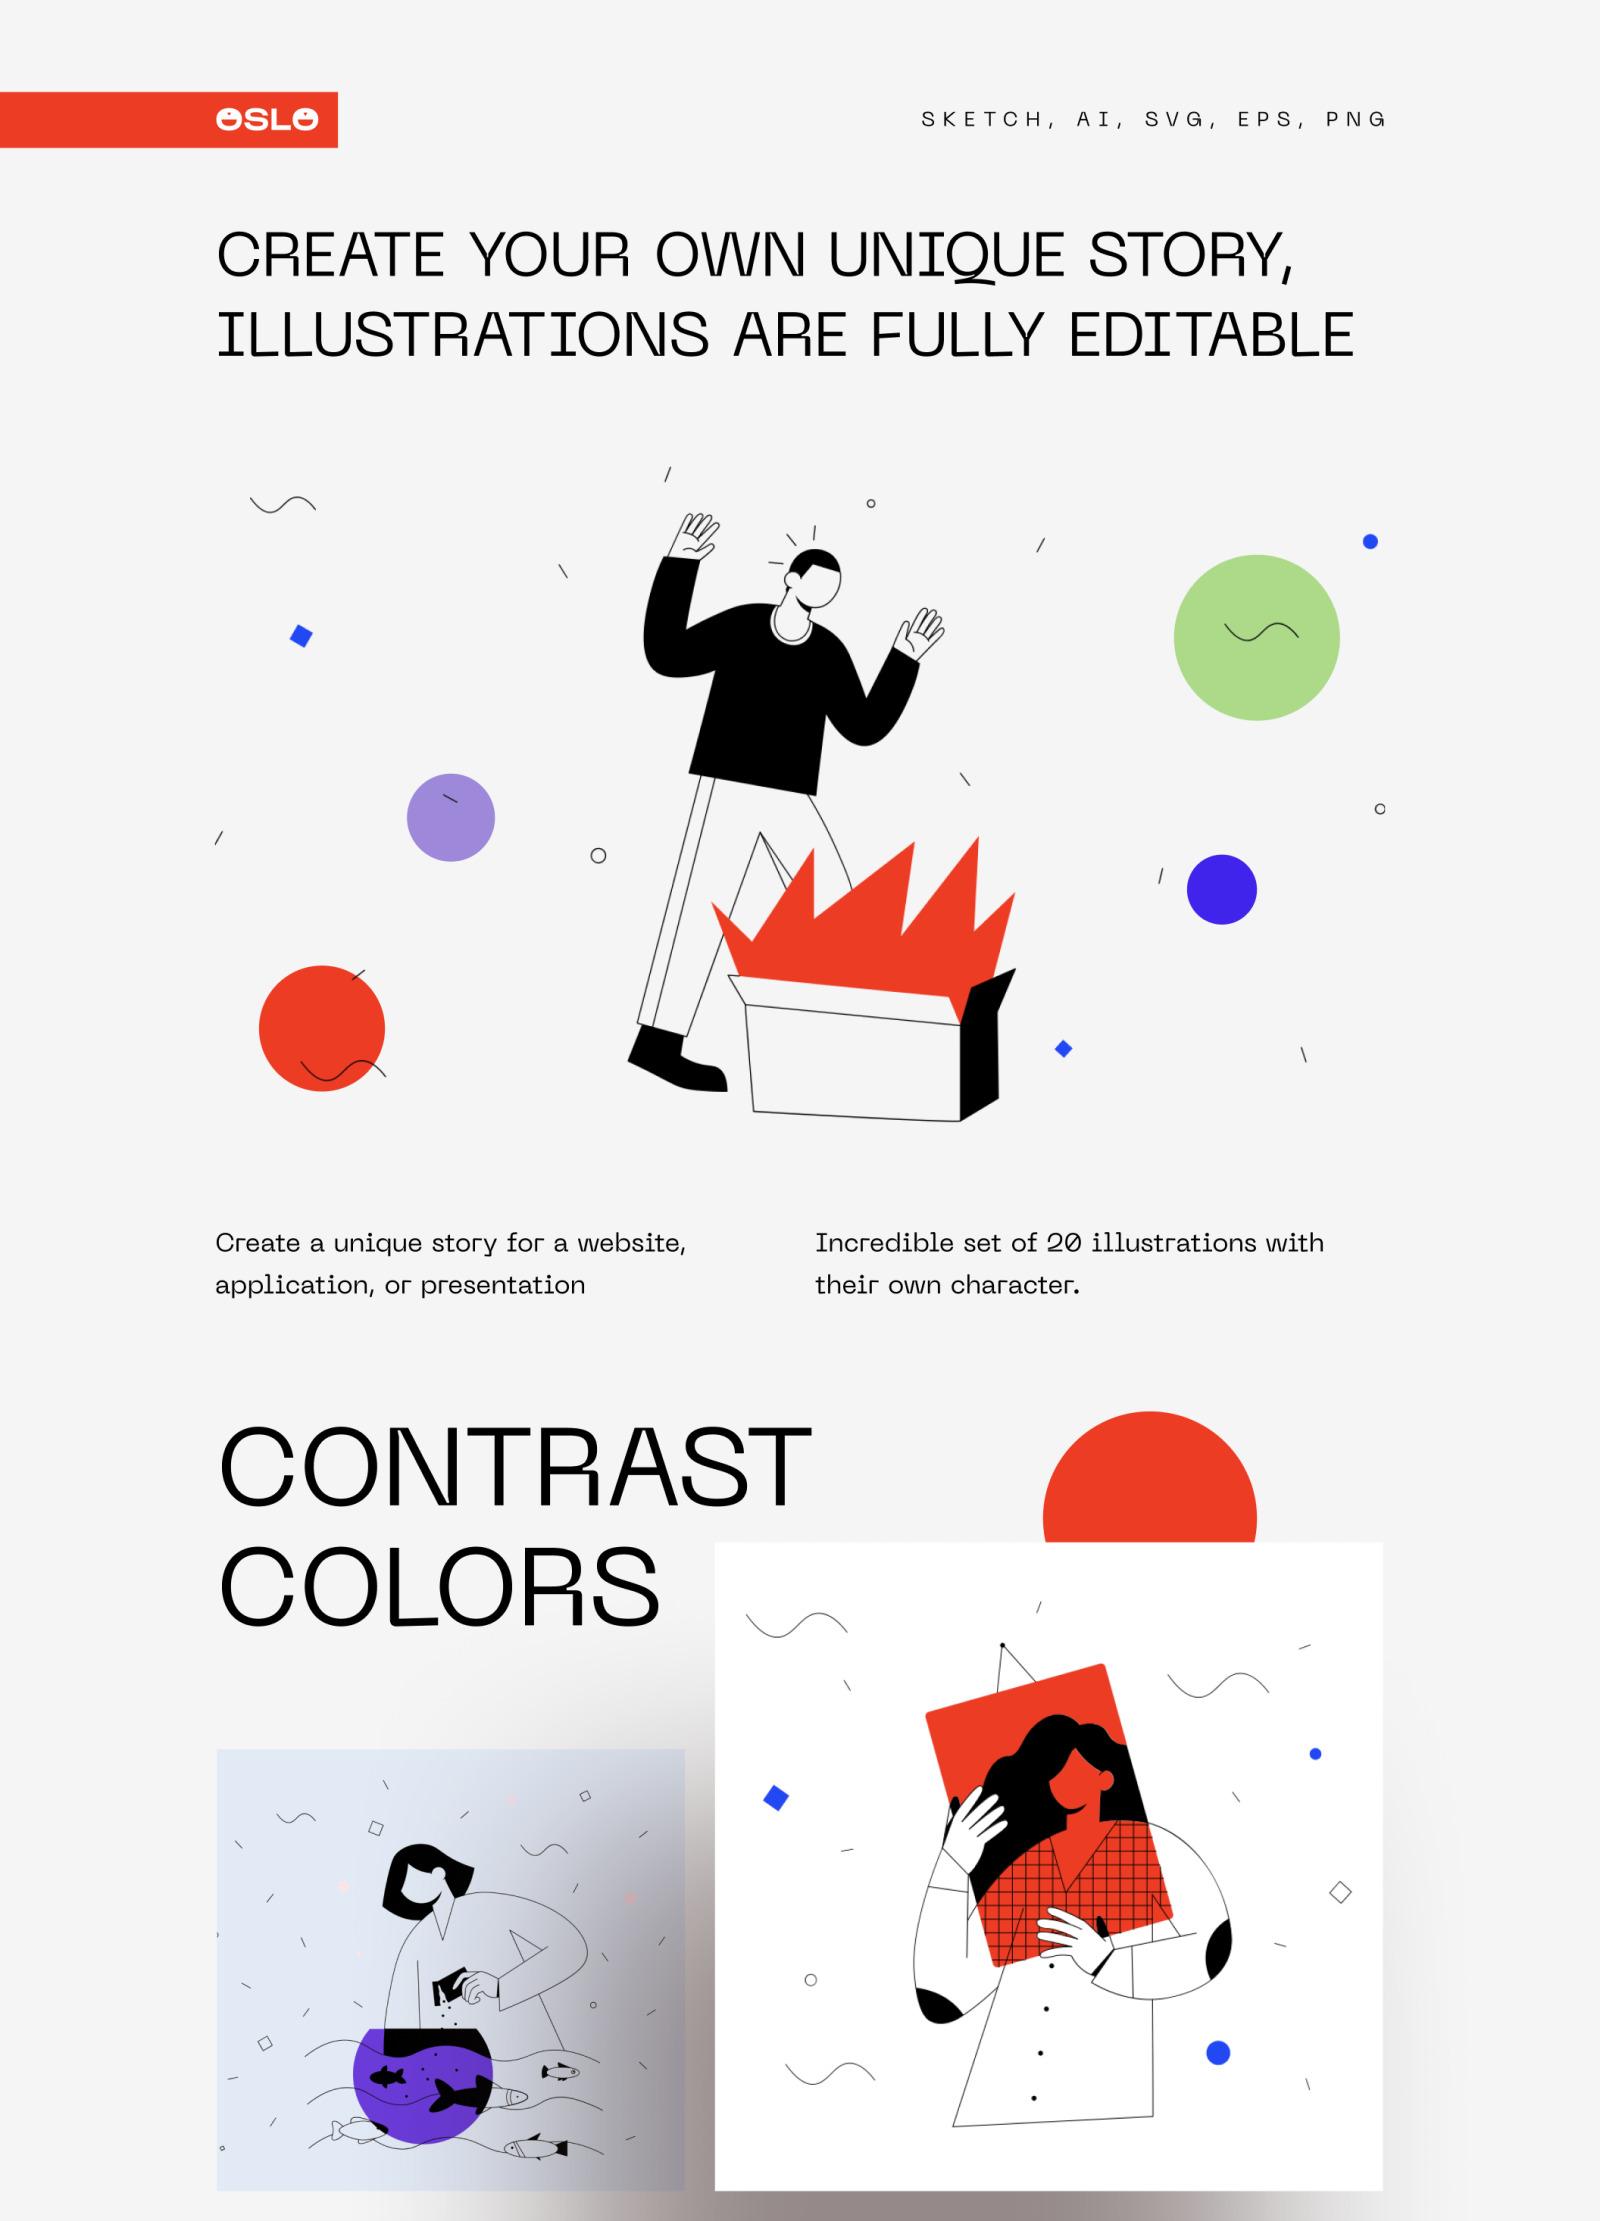 OSLO Illustrations